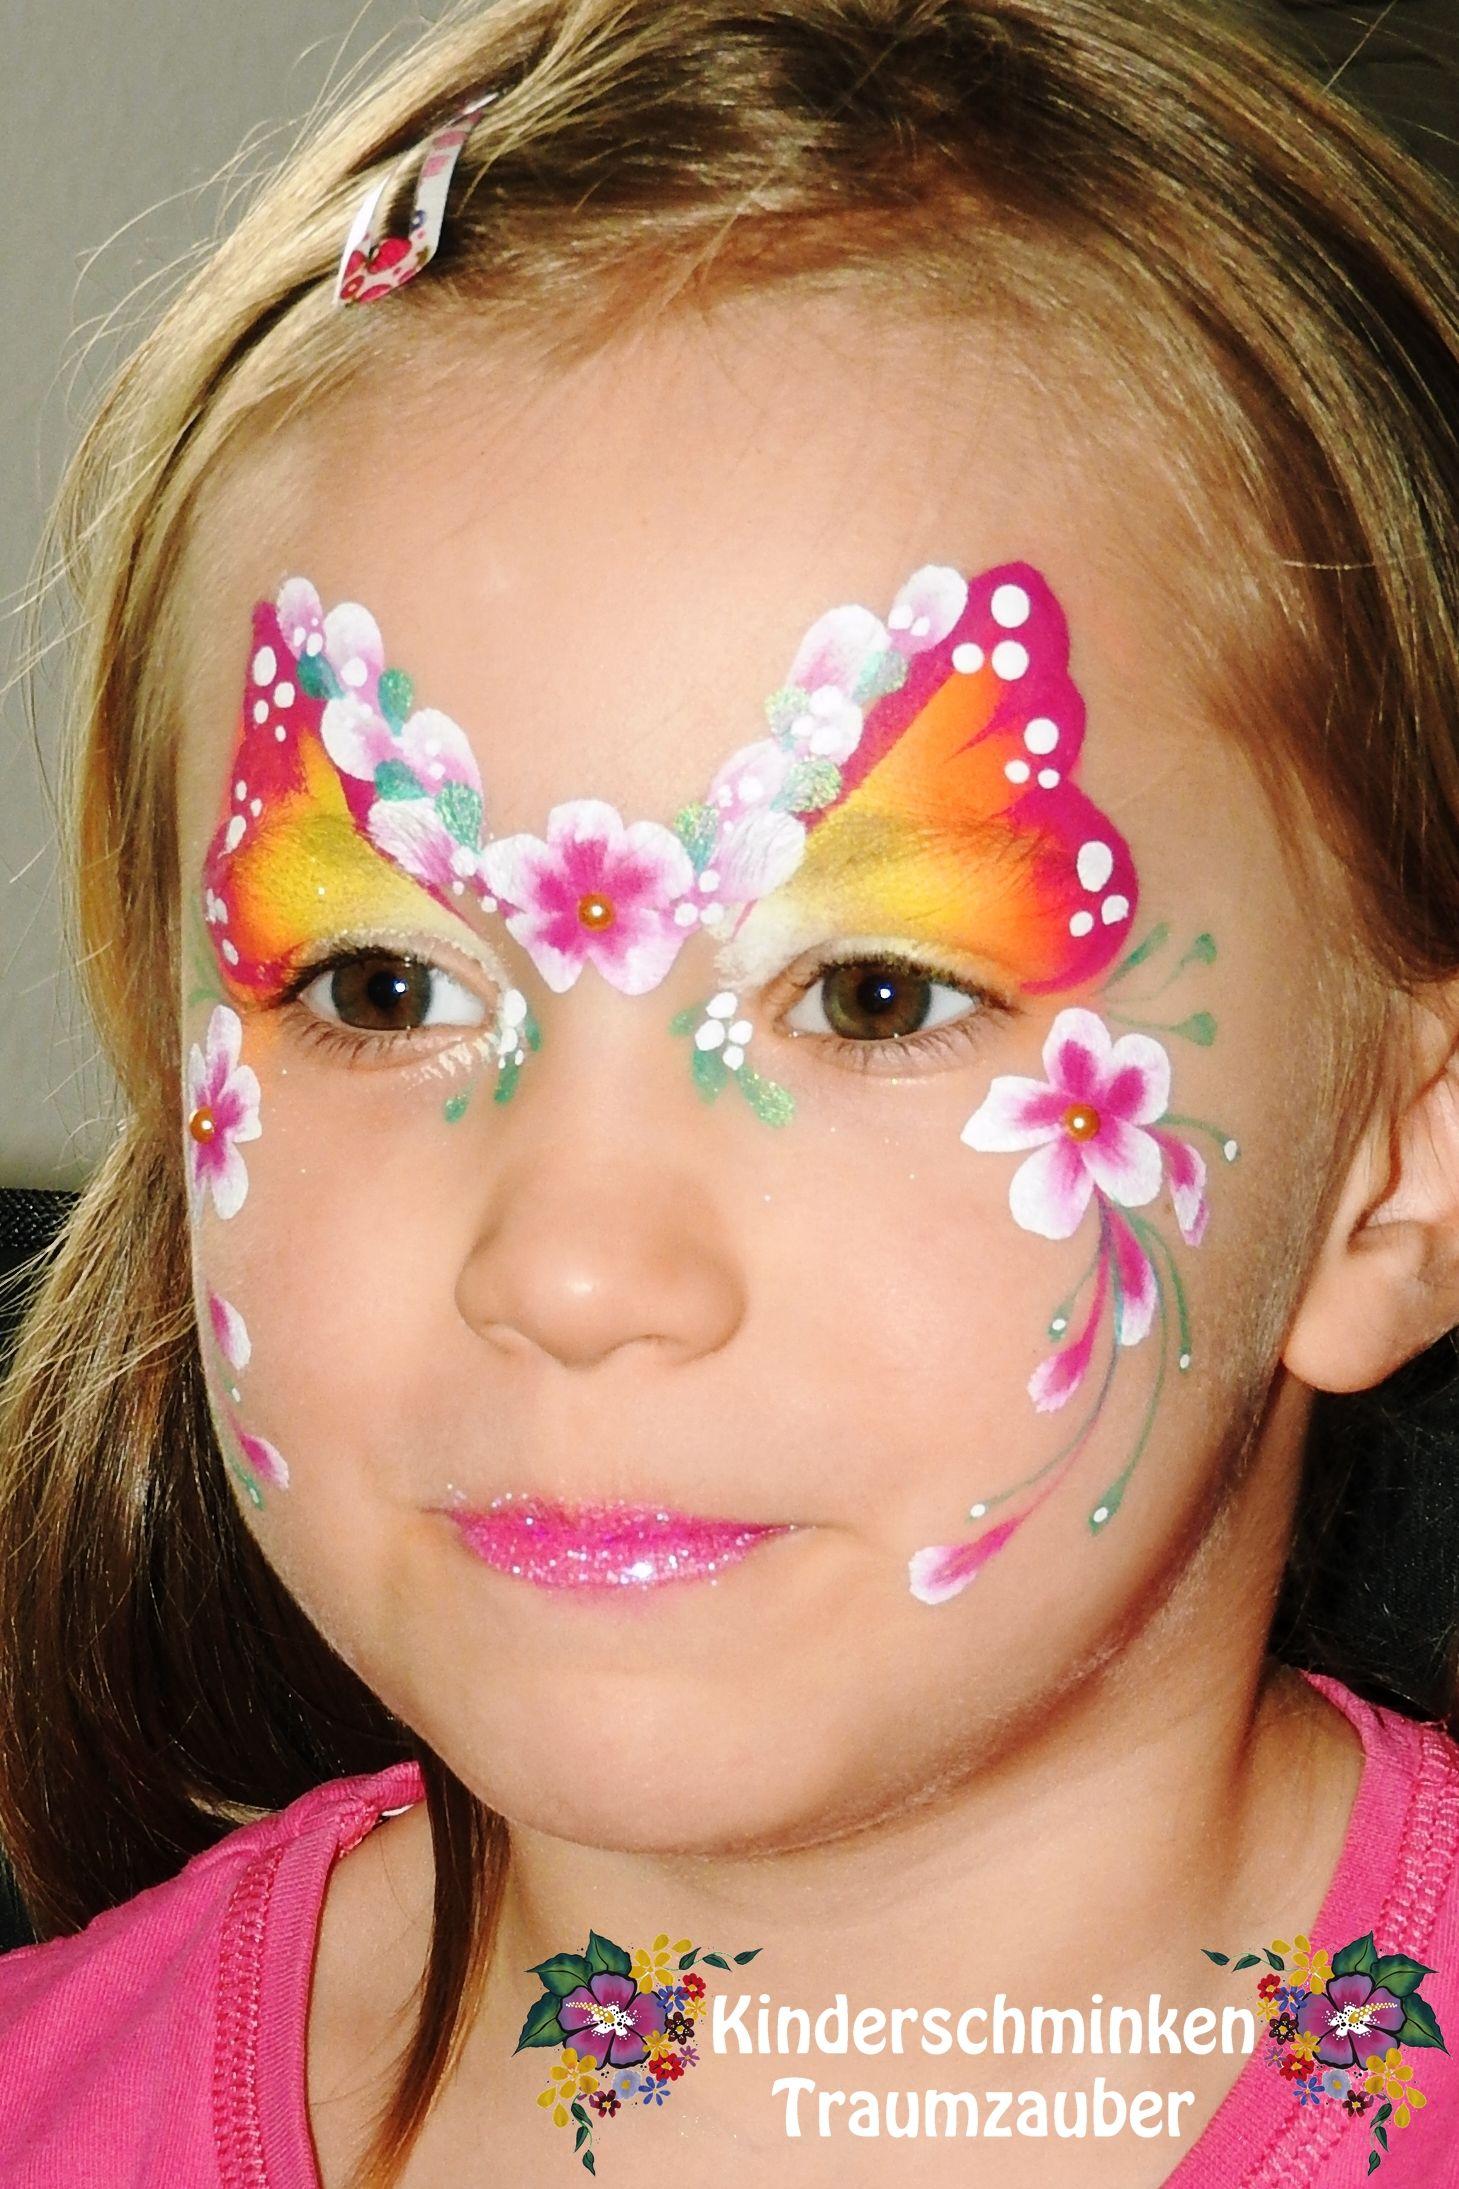 flower fairy blumen fee kinderschminken pinterest kinderschminken kinder schminken und. Black Bedroom Furniture Sets. Home Design Ideas